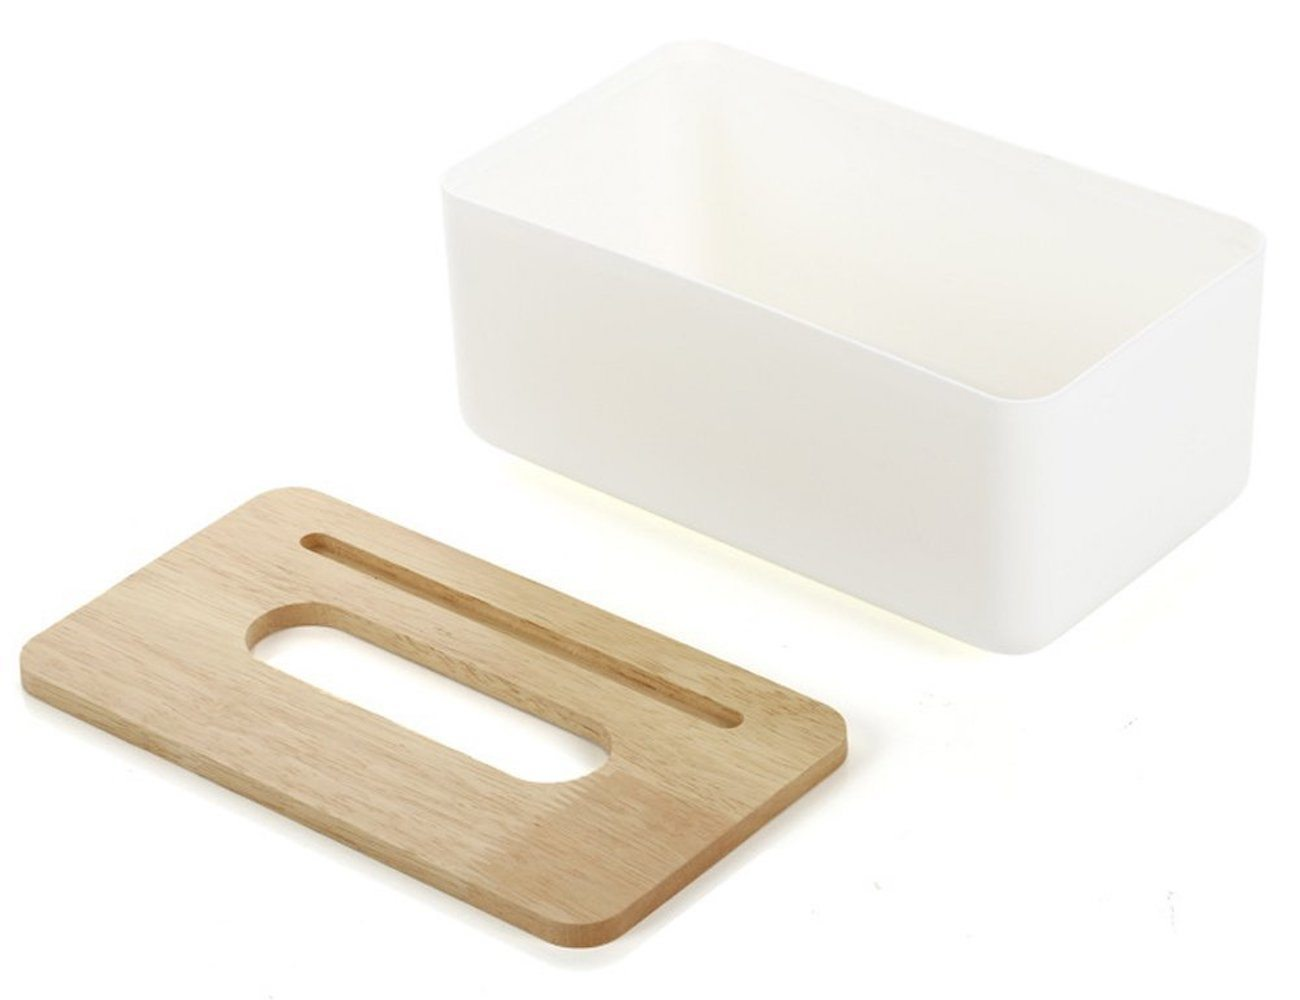 Olpchee Tissue Box Smartphone Dock